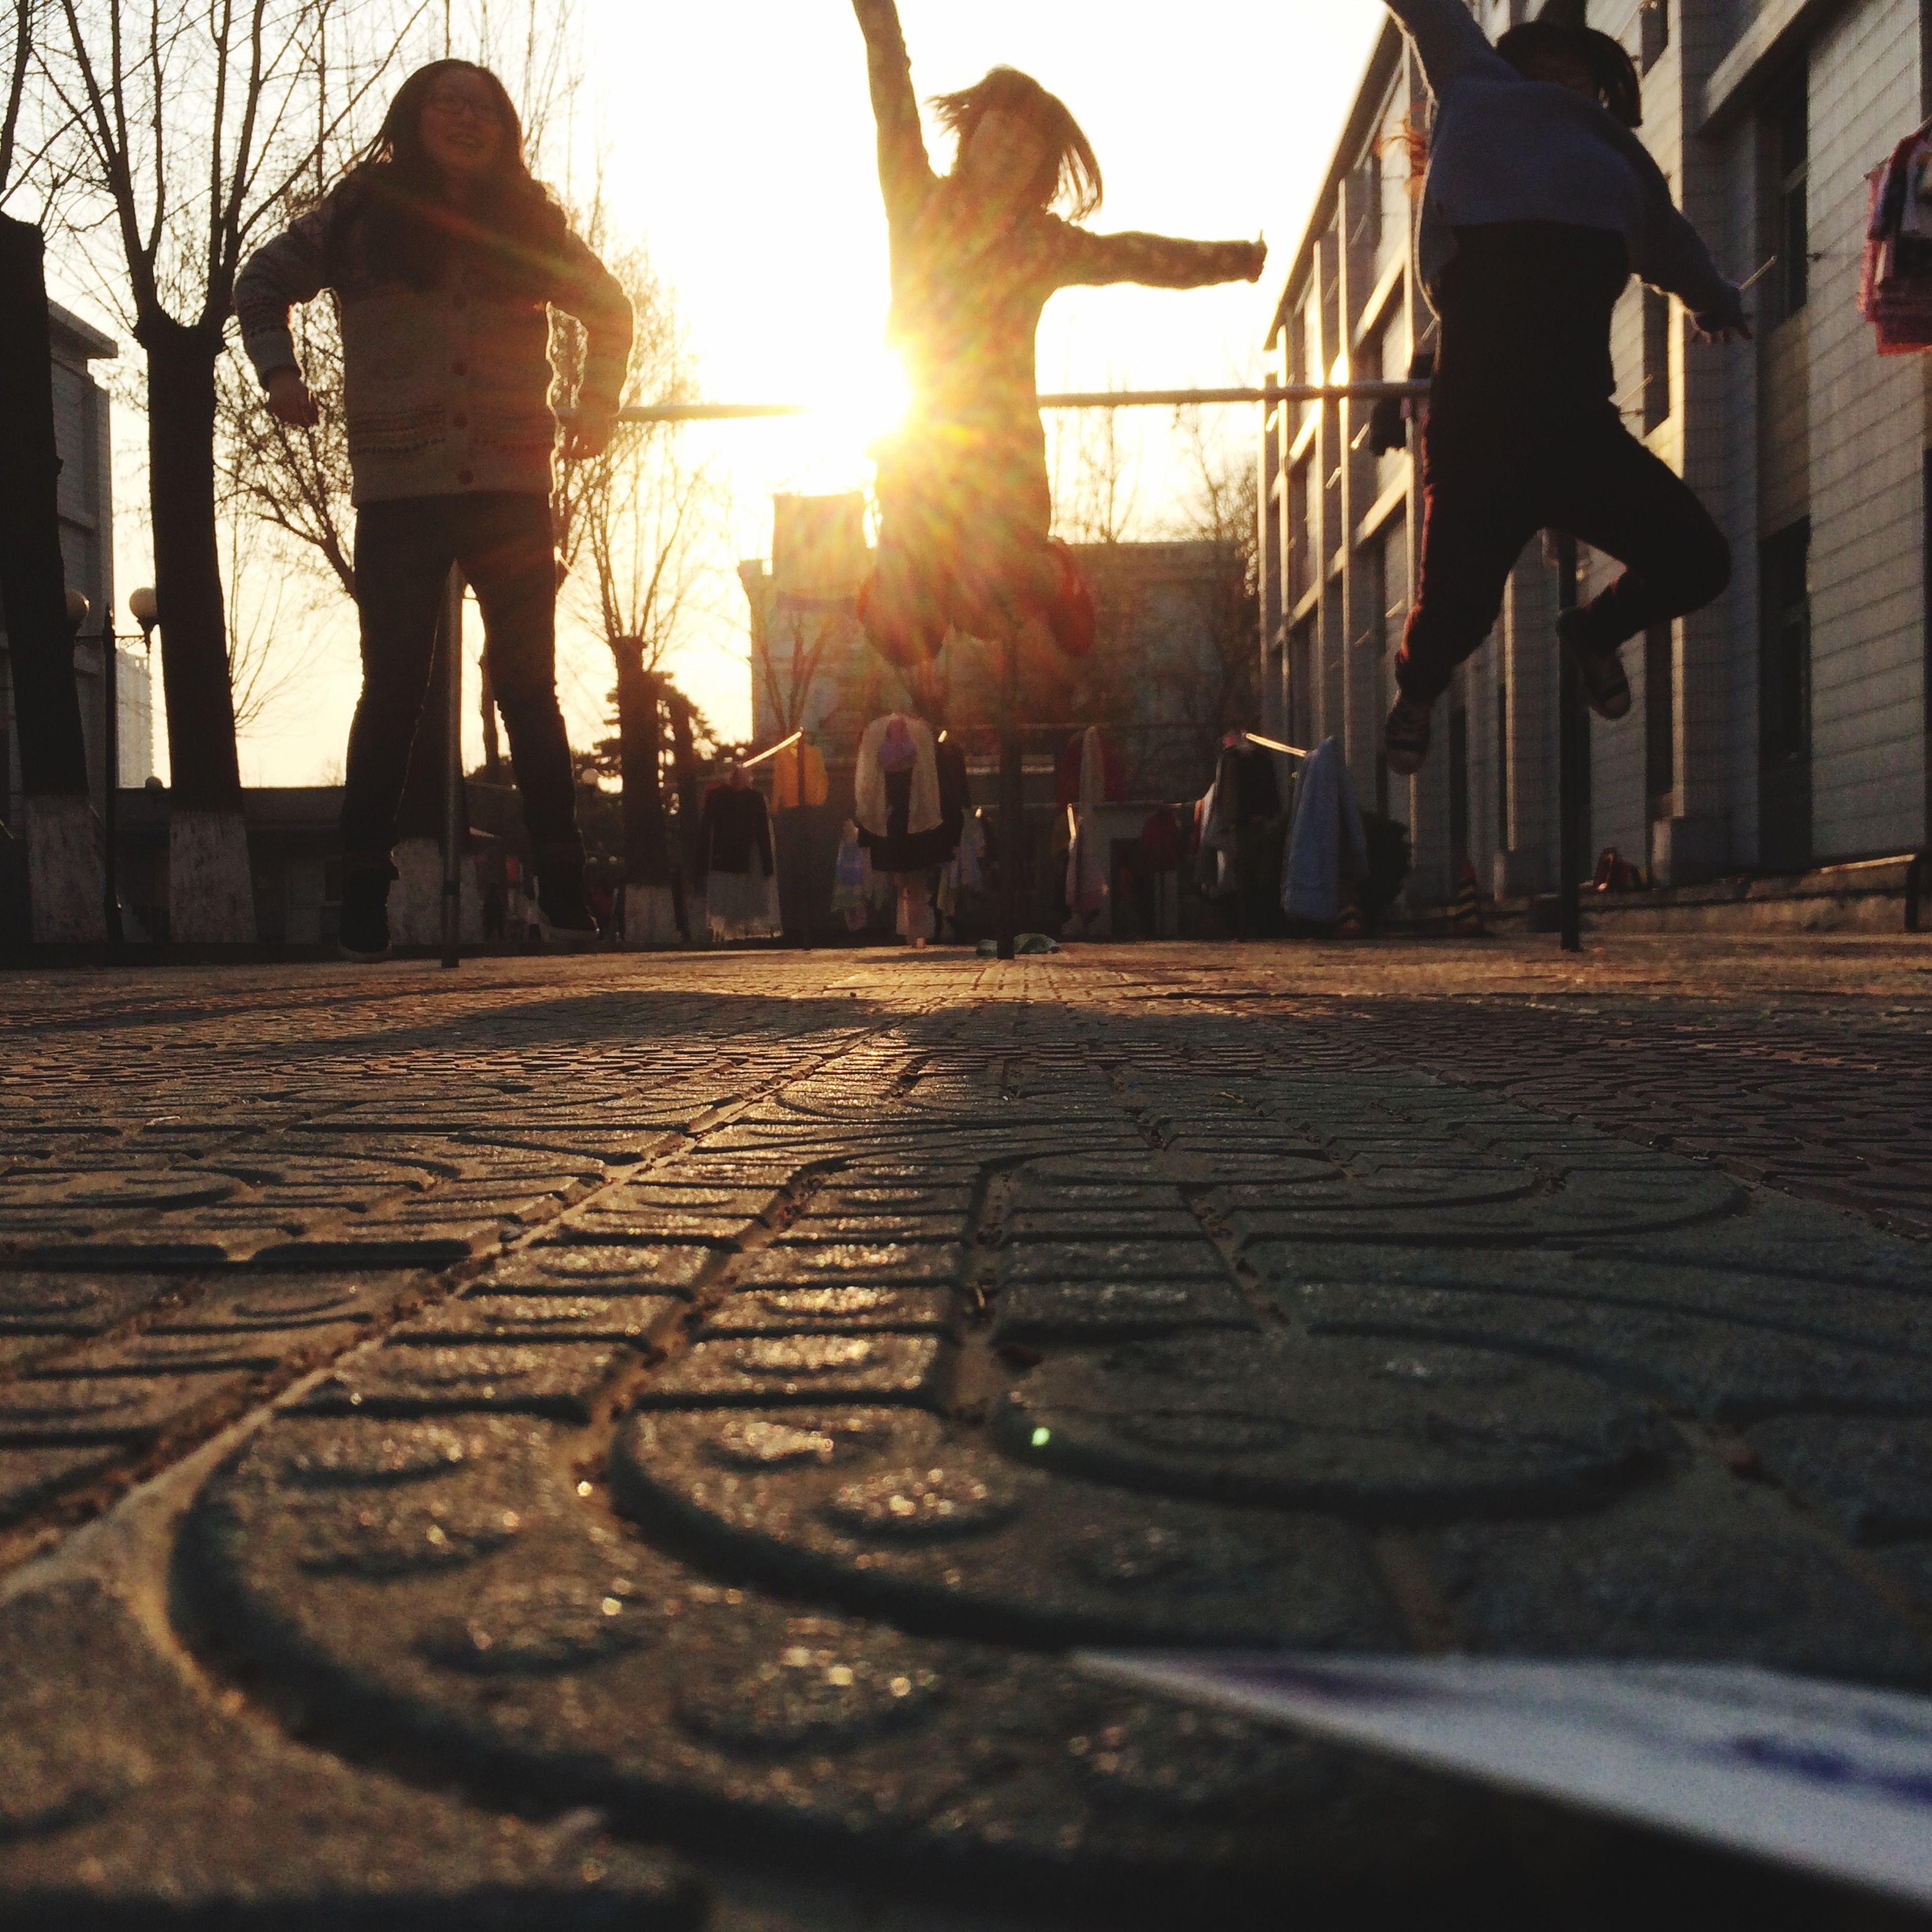 built structure, architecture, building exterior, lifestyles, leisure activity, sunlight, men, sunset, sun, sunbeam, person, cobblestone, walking, sky, shadow, street, city